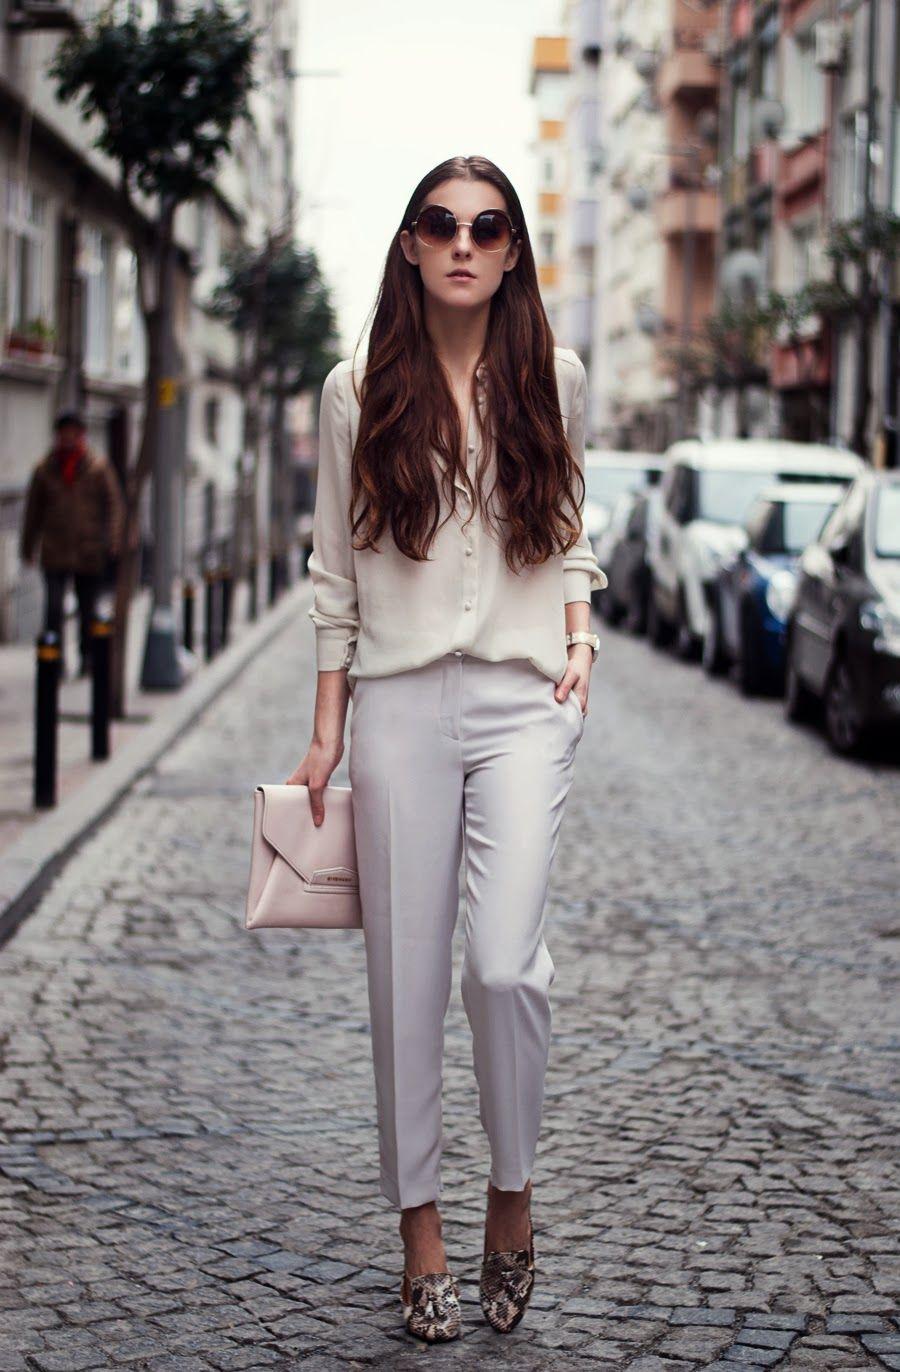 Neon Rock / SPRING PASTELS //  #Fashion, #FashionBlog, #FashionBlogger, #Ootd, #OutfitOfTheDay, #Style